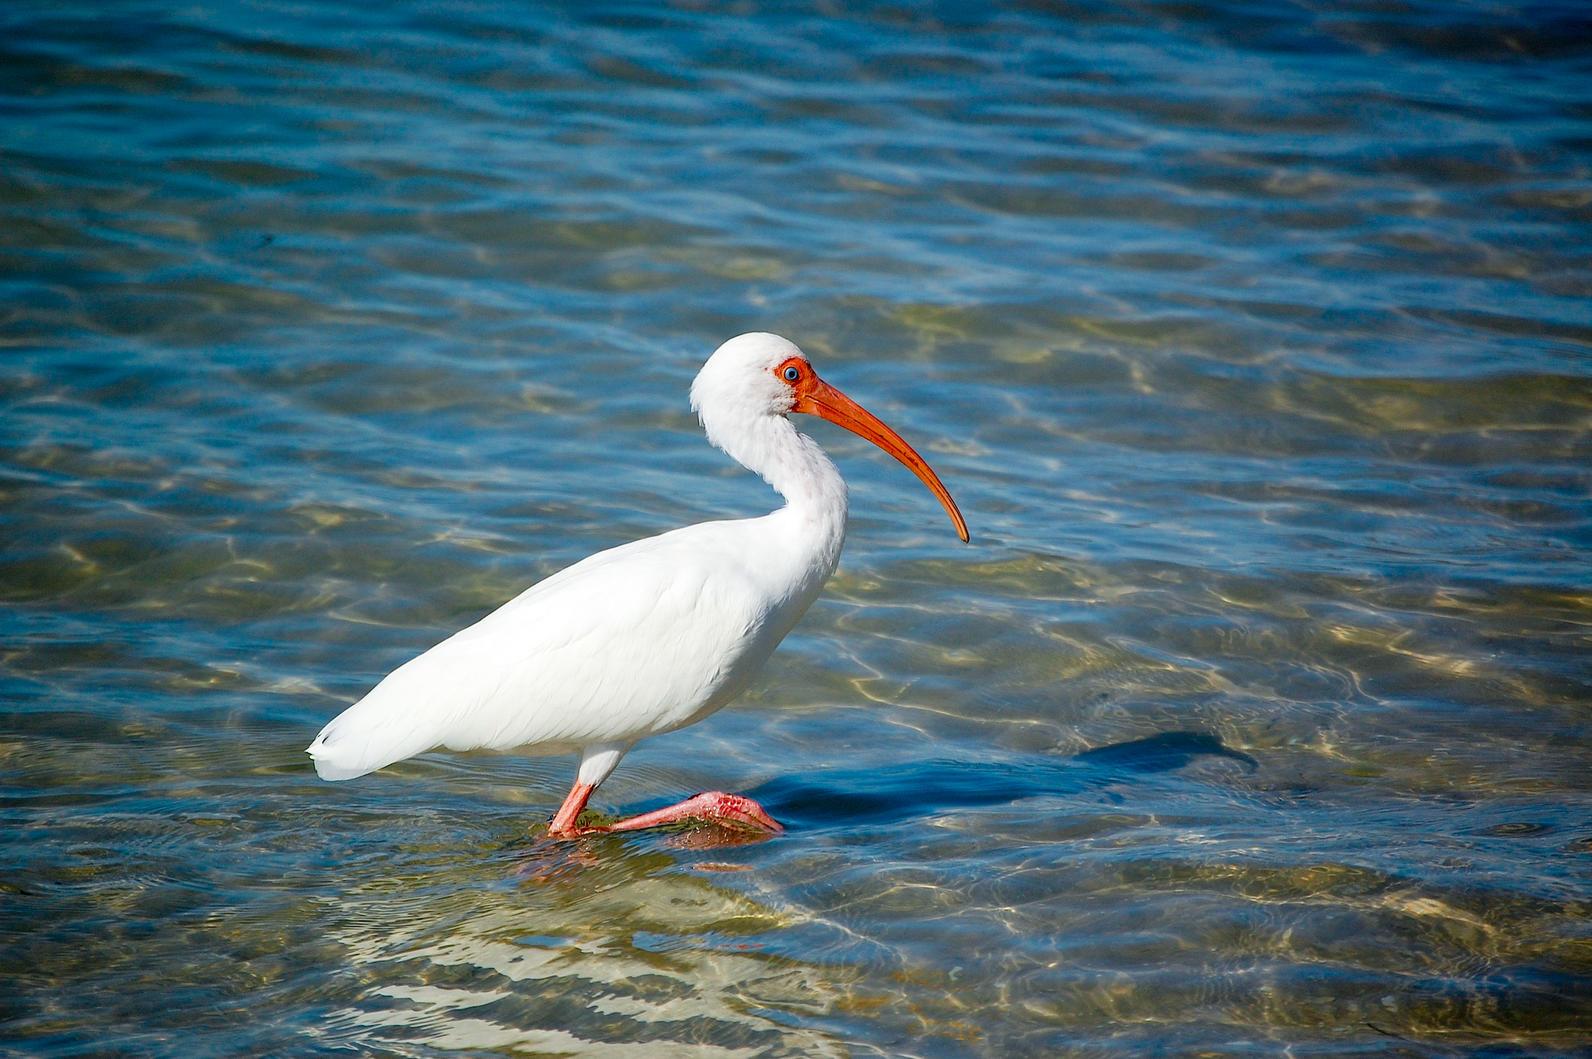 Species: White Ibis. Photographer: Scott Kinsey